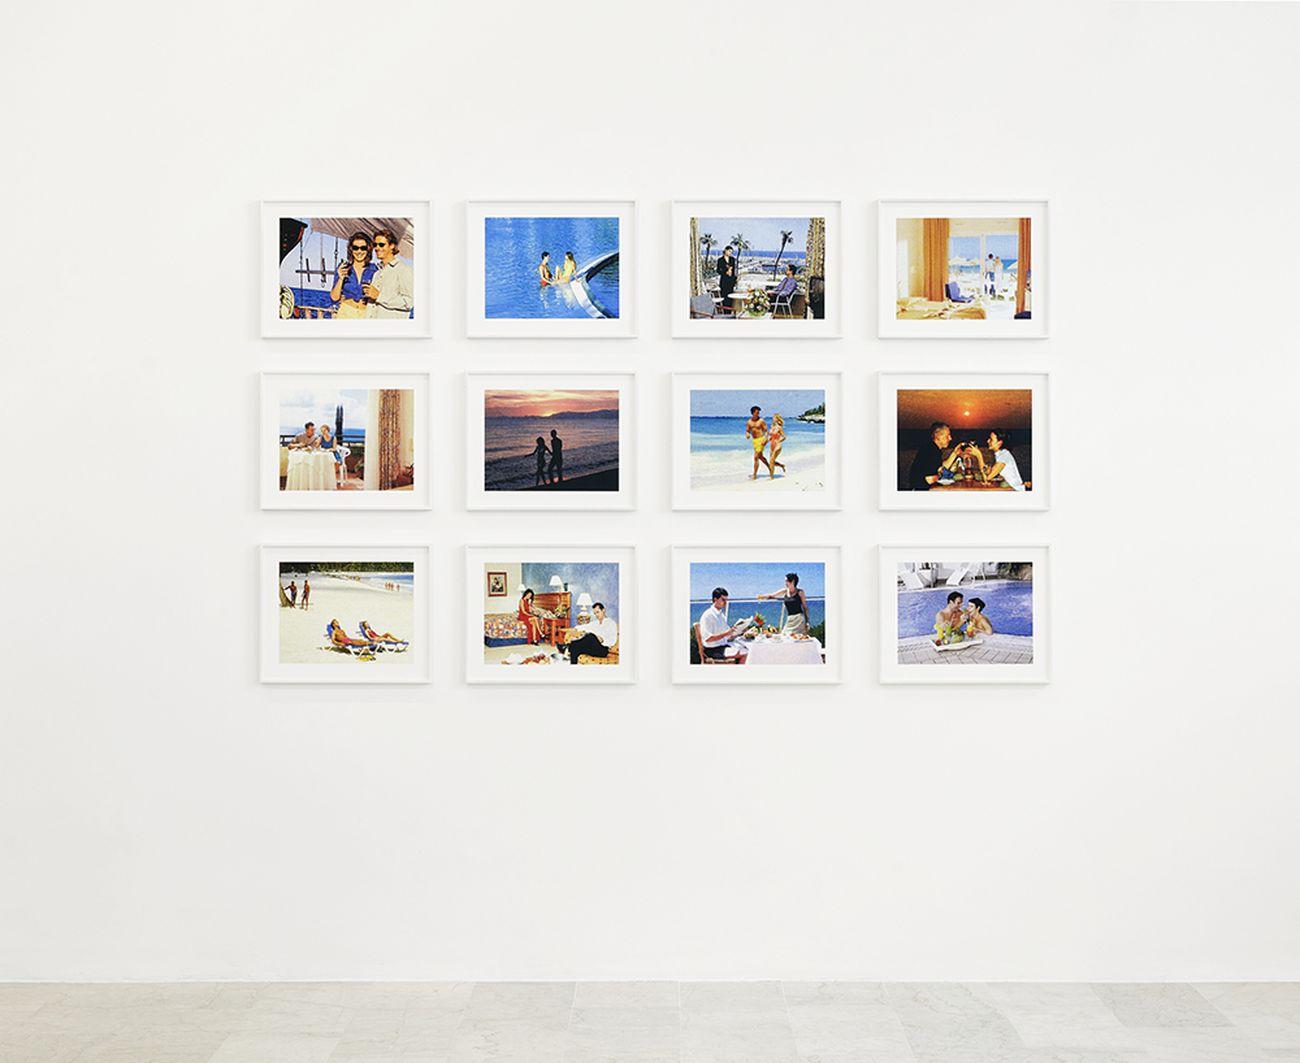 Joachim Schmid, Meetings, 2003 07, 12 stampe a inchiostro pigmentato, cm 30x40 cad., ed. 3+1AP. Photo C. Favero